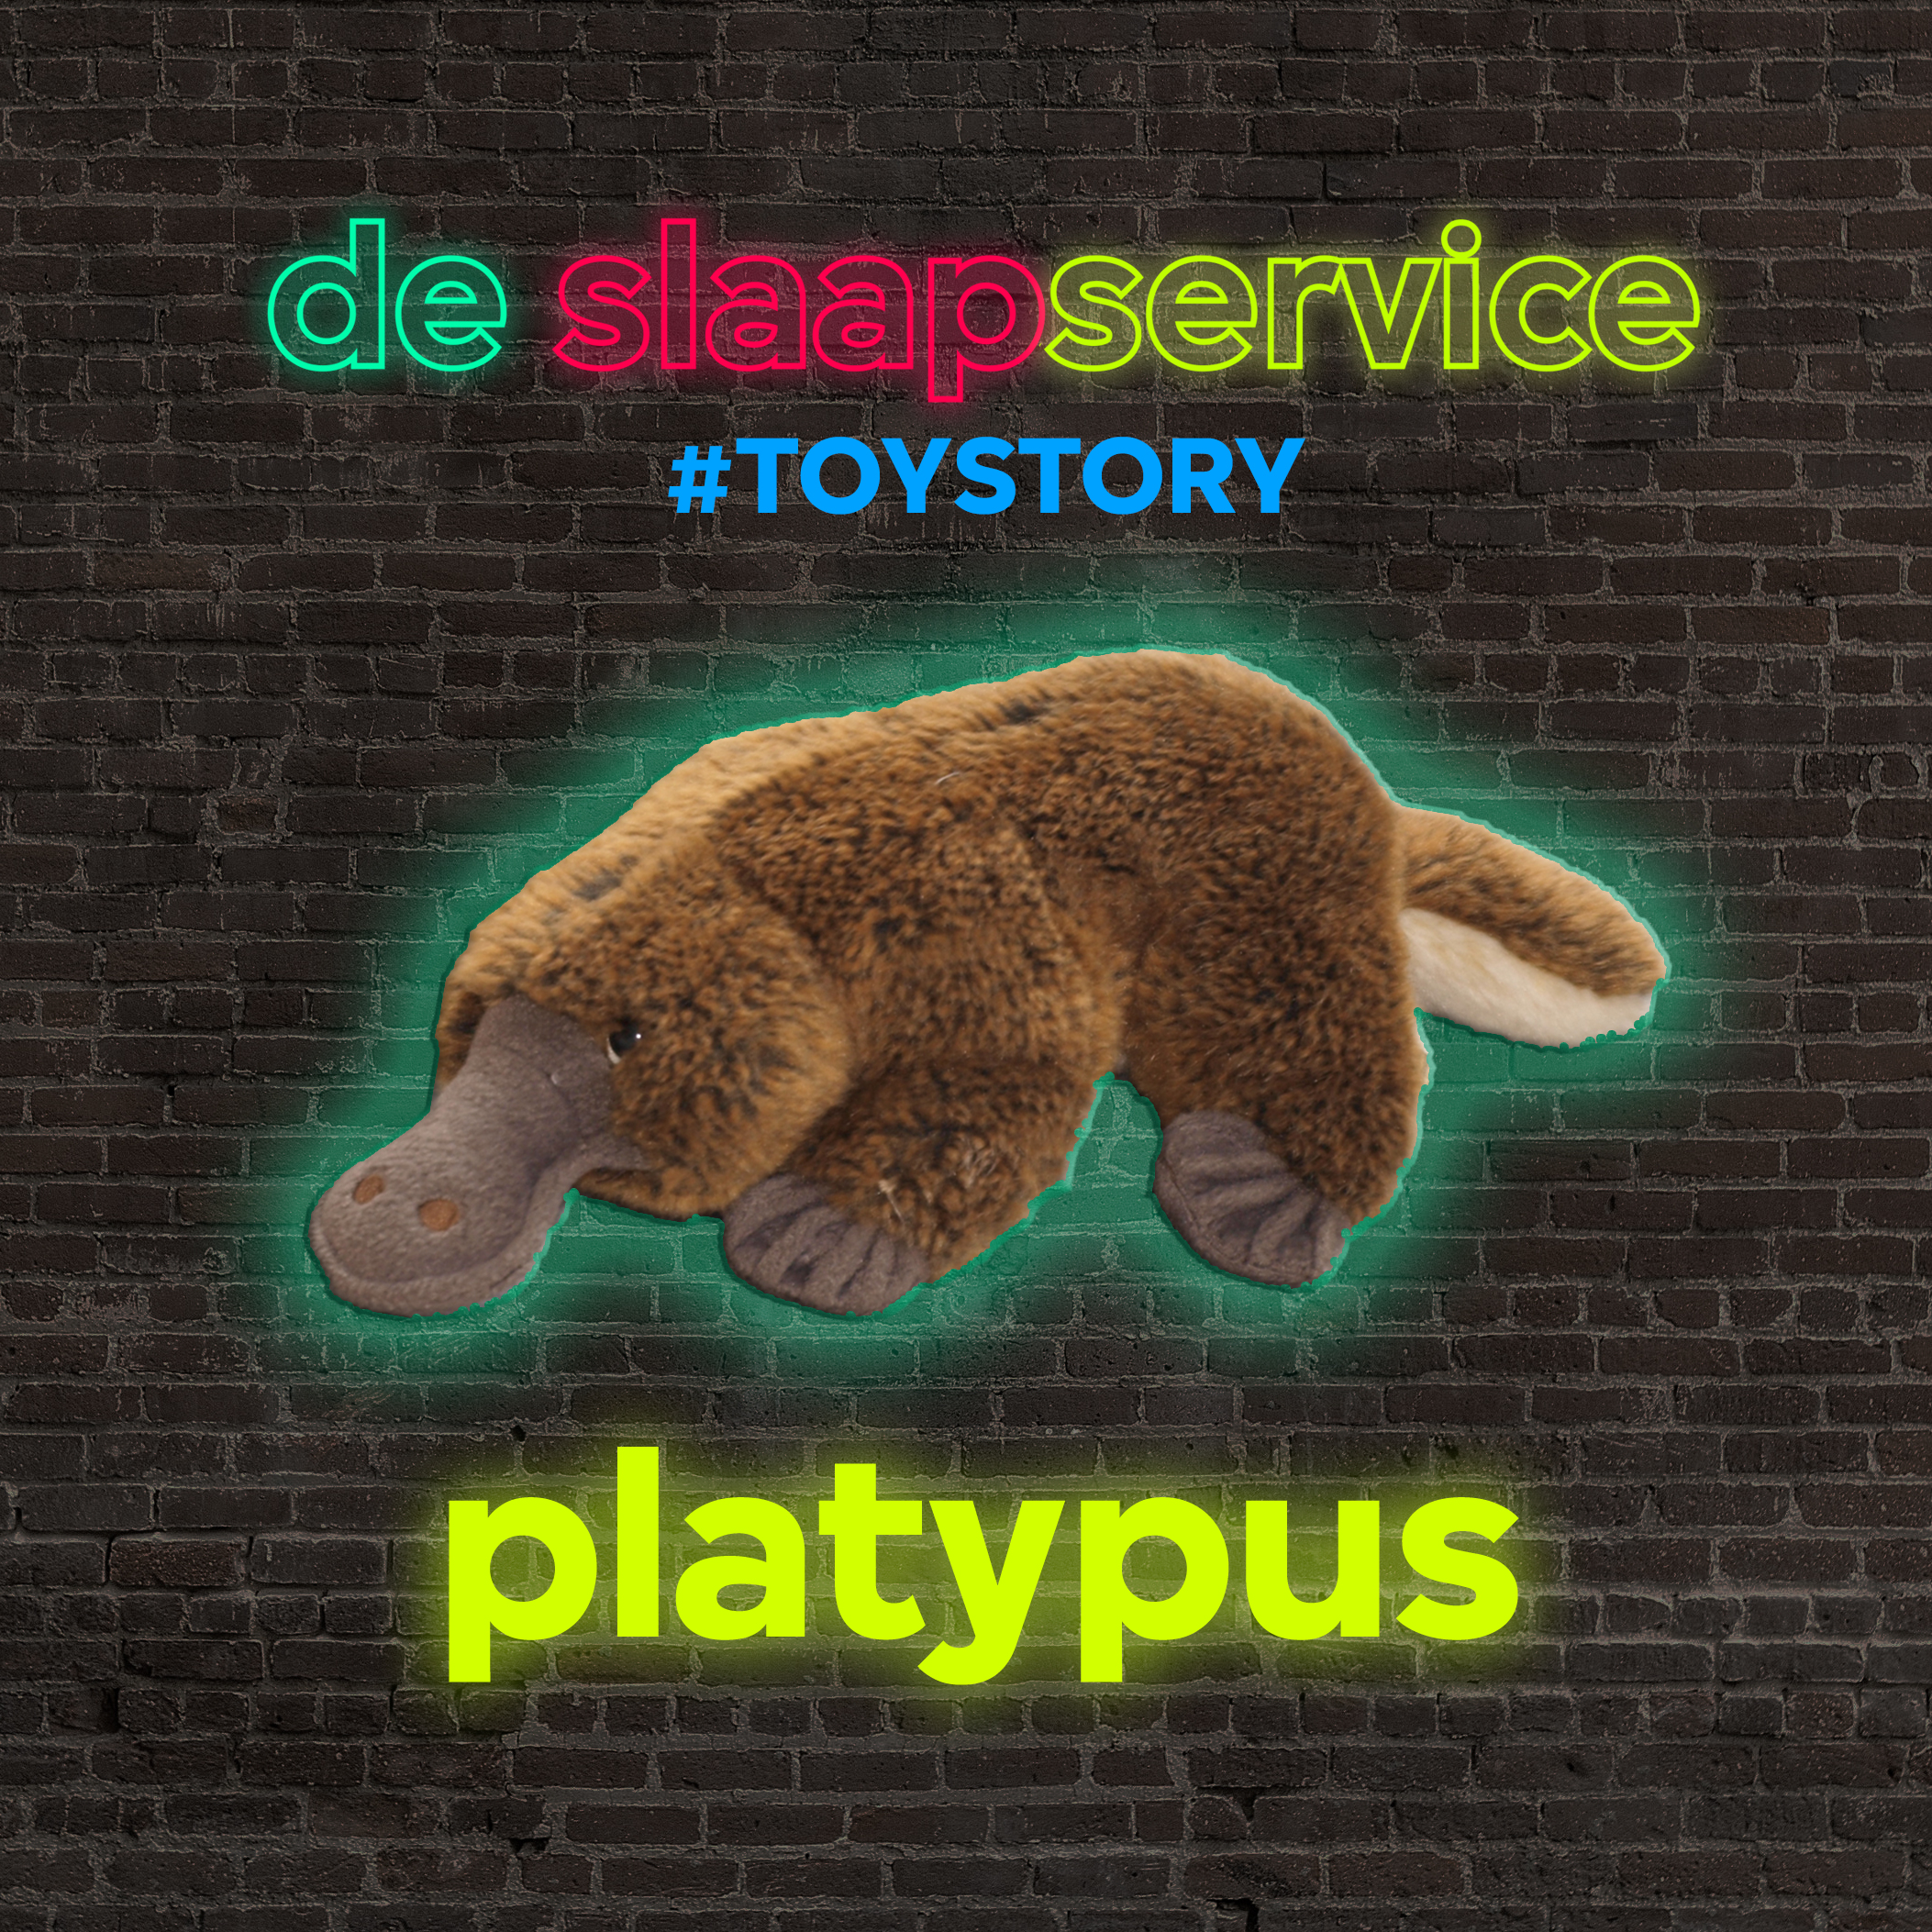 TOYSTORY-PLATYPUS.jpg